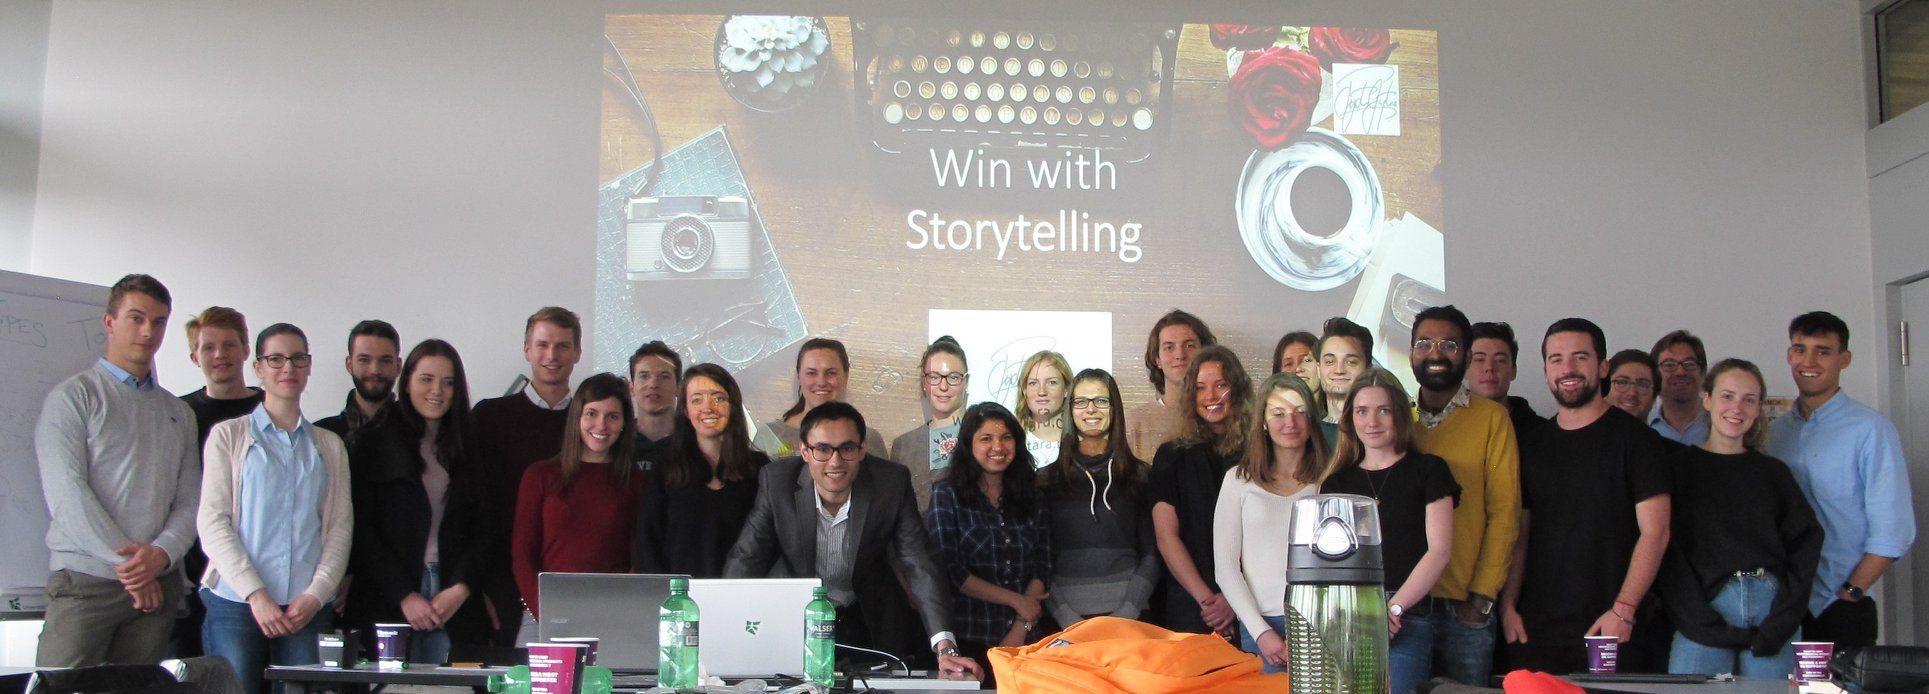 storytelling communications at HSG by Jyoti Guptara author novelist writer